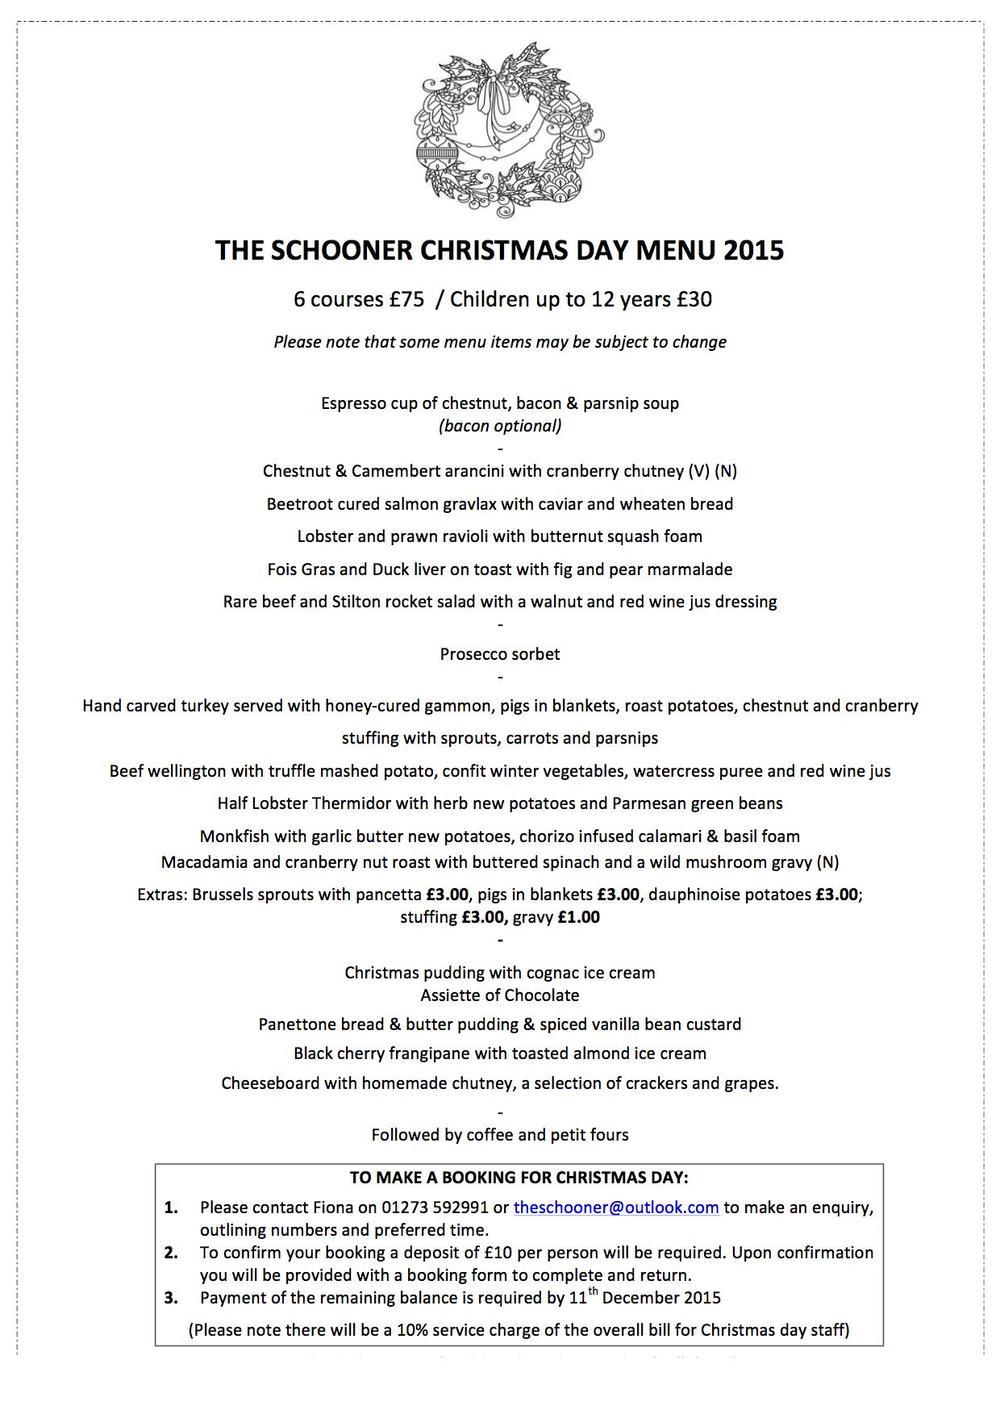 Christmas day menu (2015).jpg